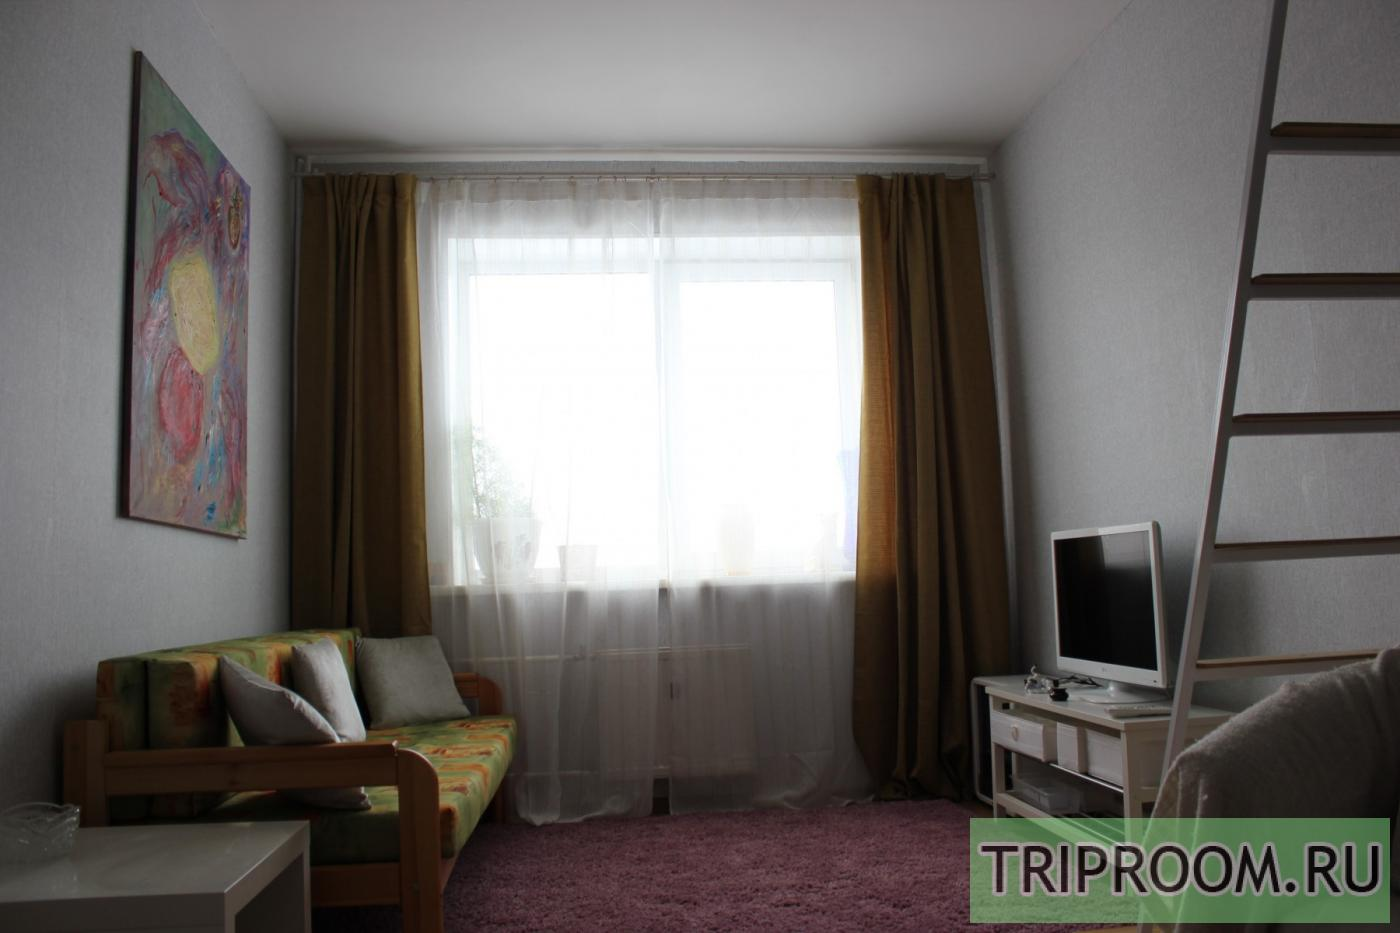 1-комнатная квартира посуточно (вариант № 34045), ул. Краснознаменная улица, фото № 3